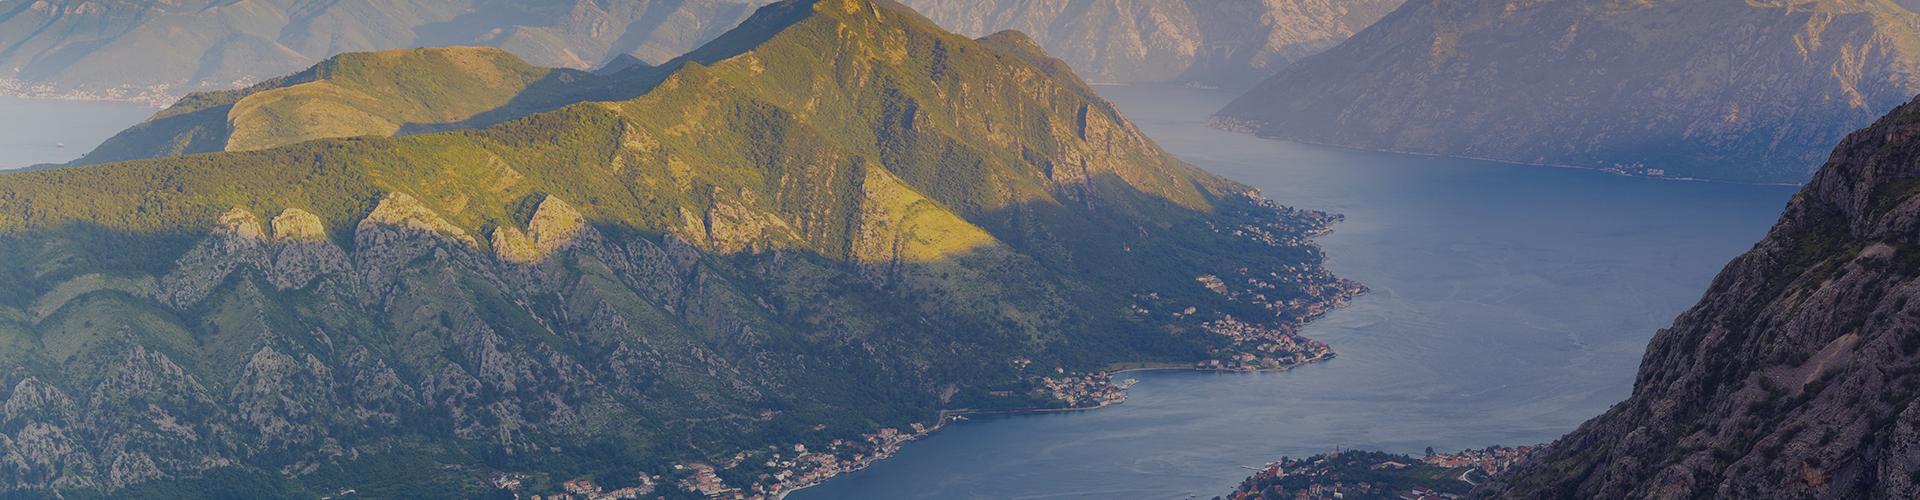 Landmark photograph of Montenegro